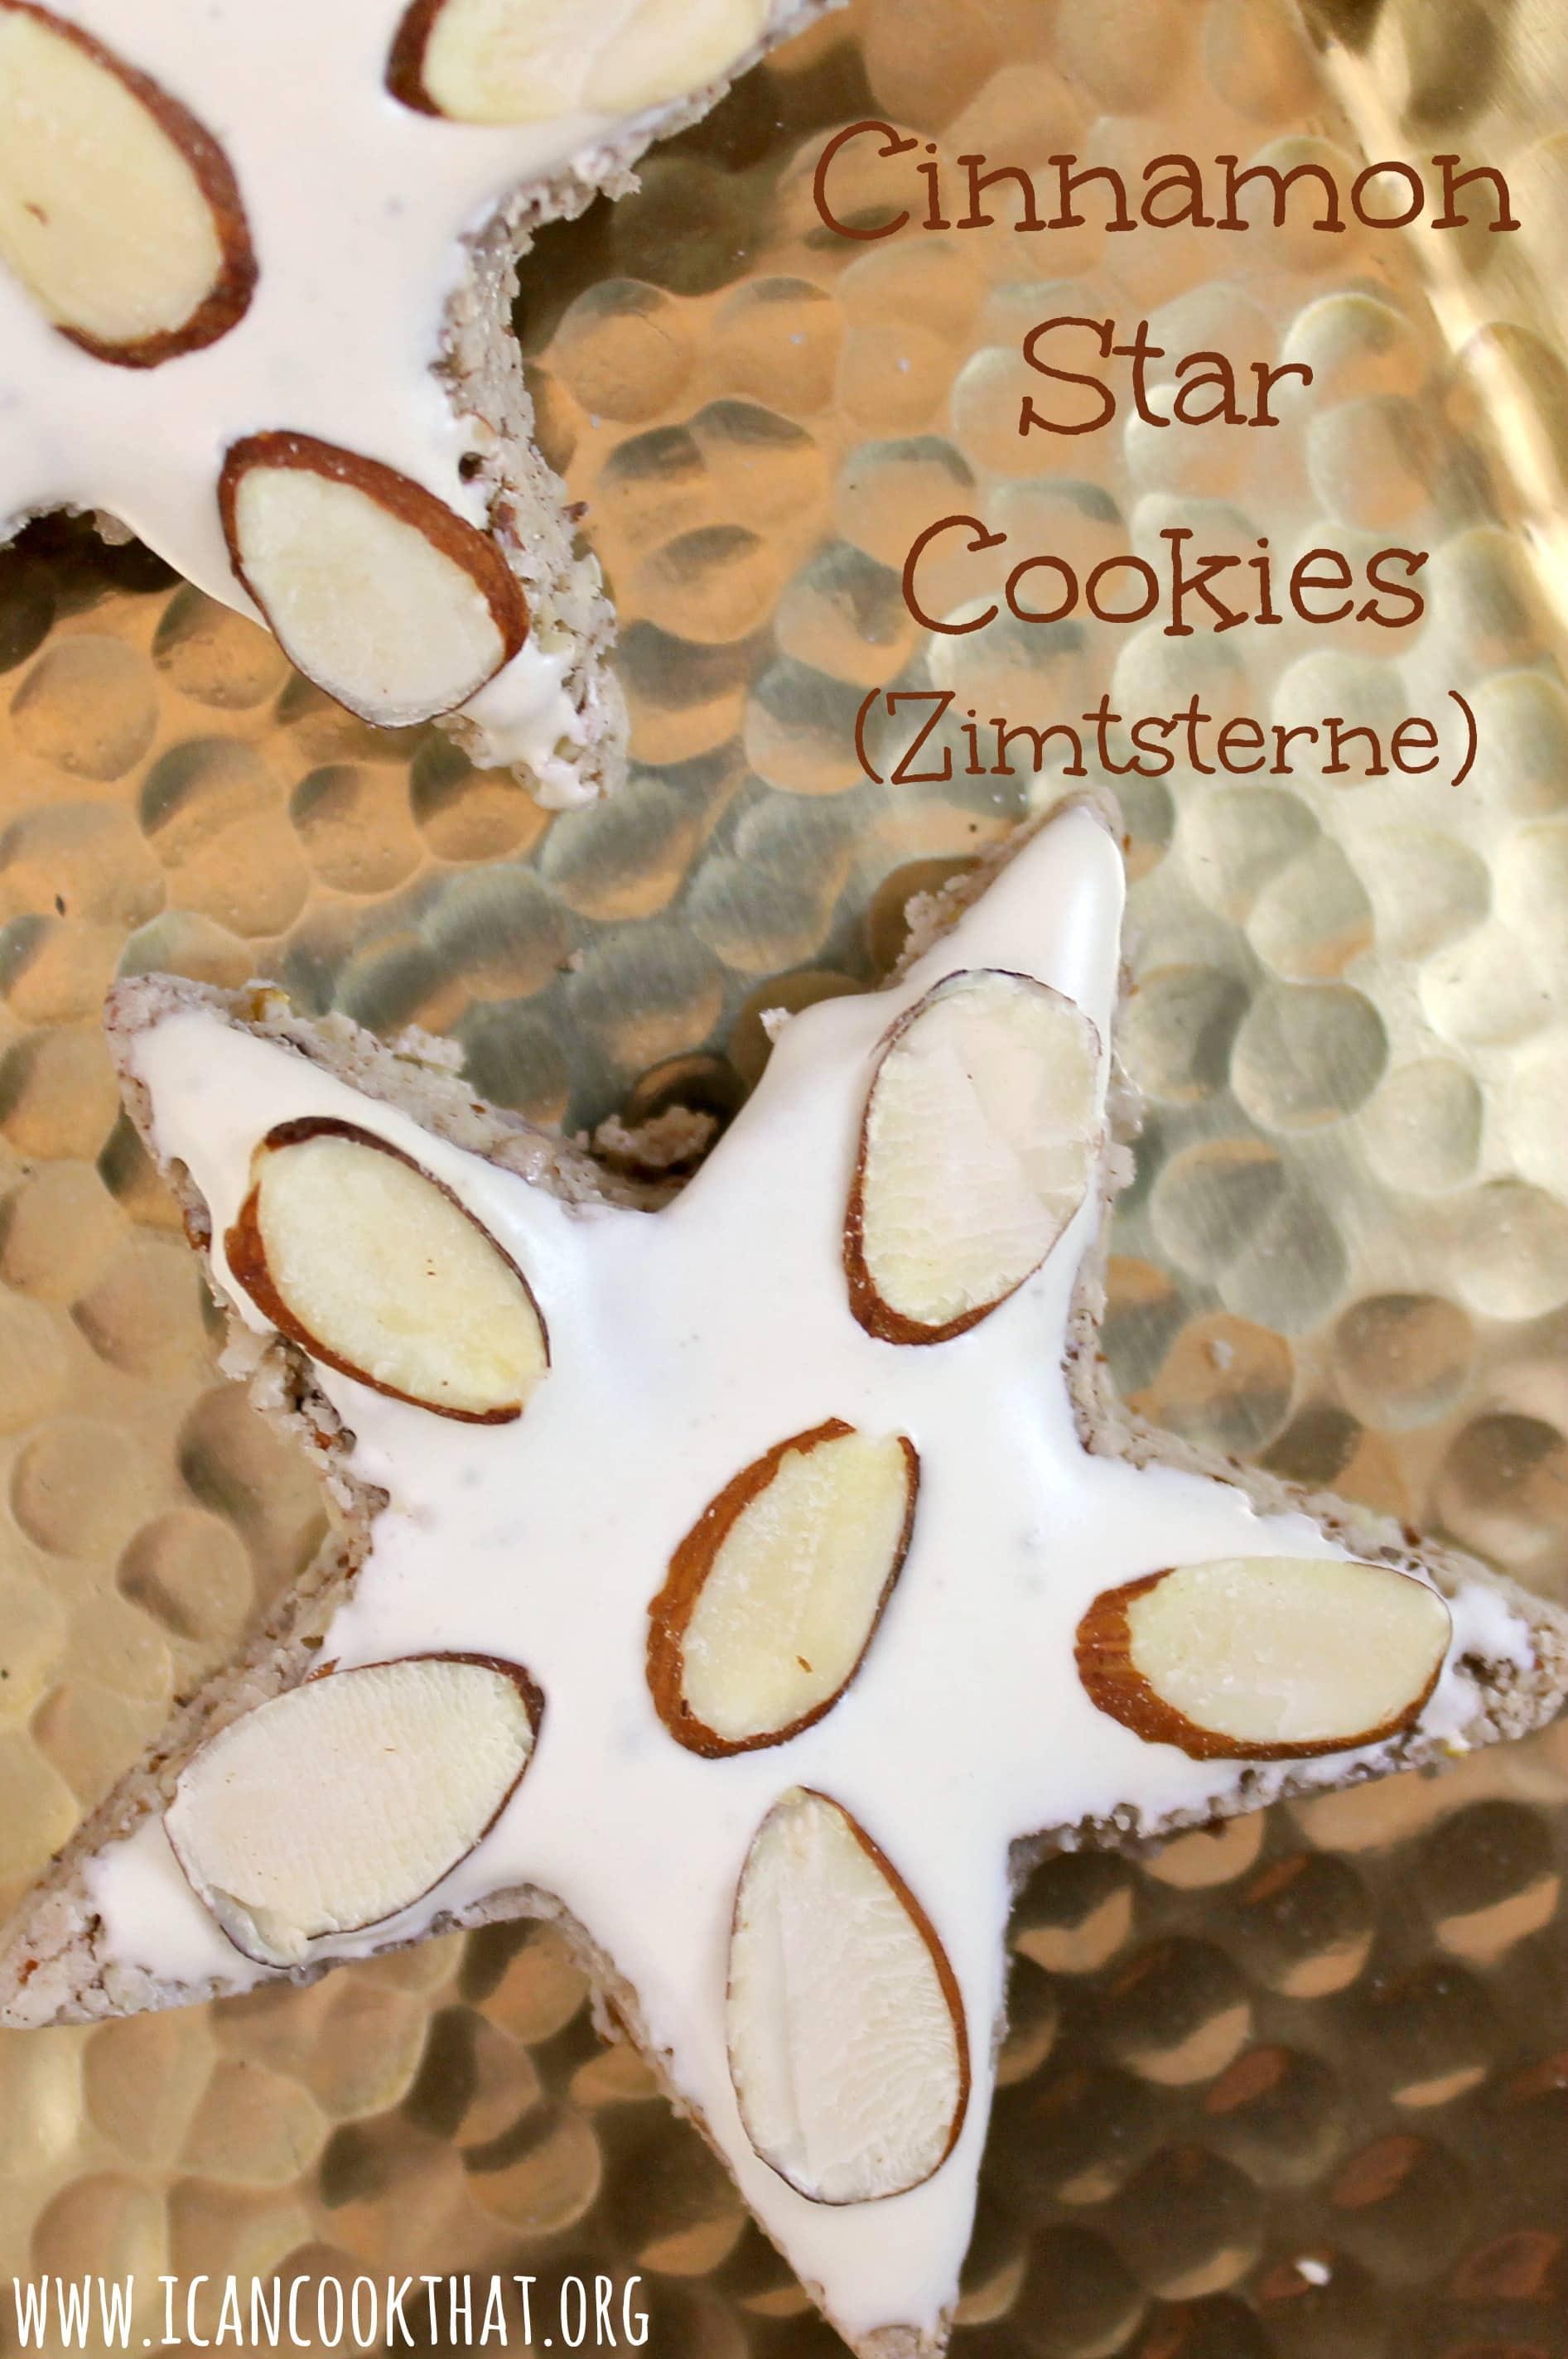 Gluten Free Cinnamon Star Cookies Zimtsterne Recipe I Can Cook That